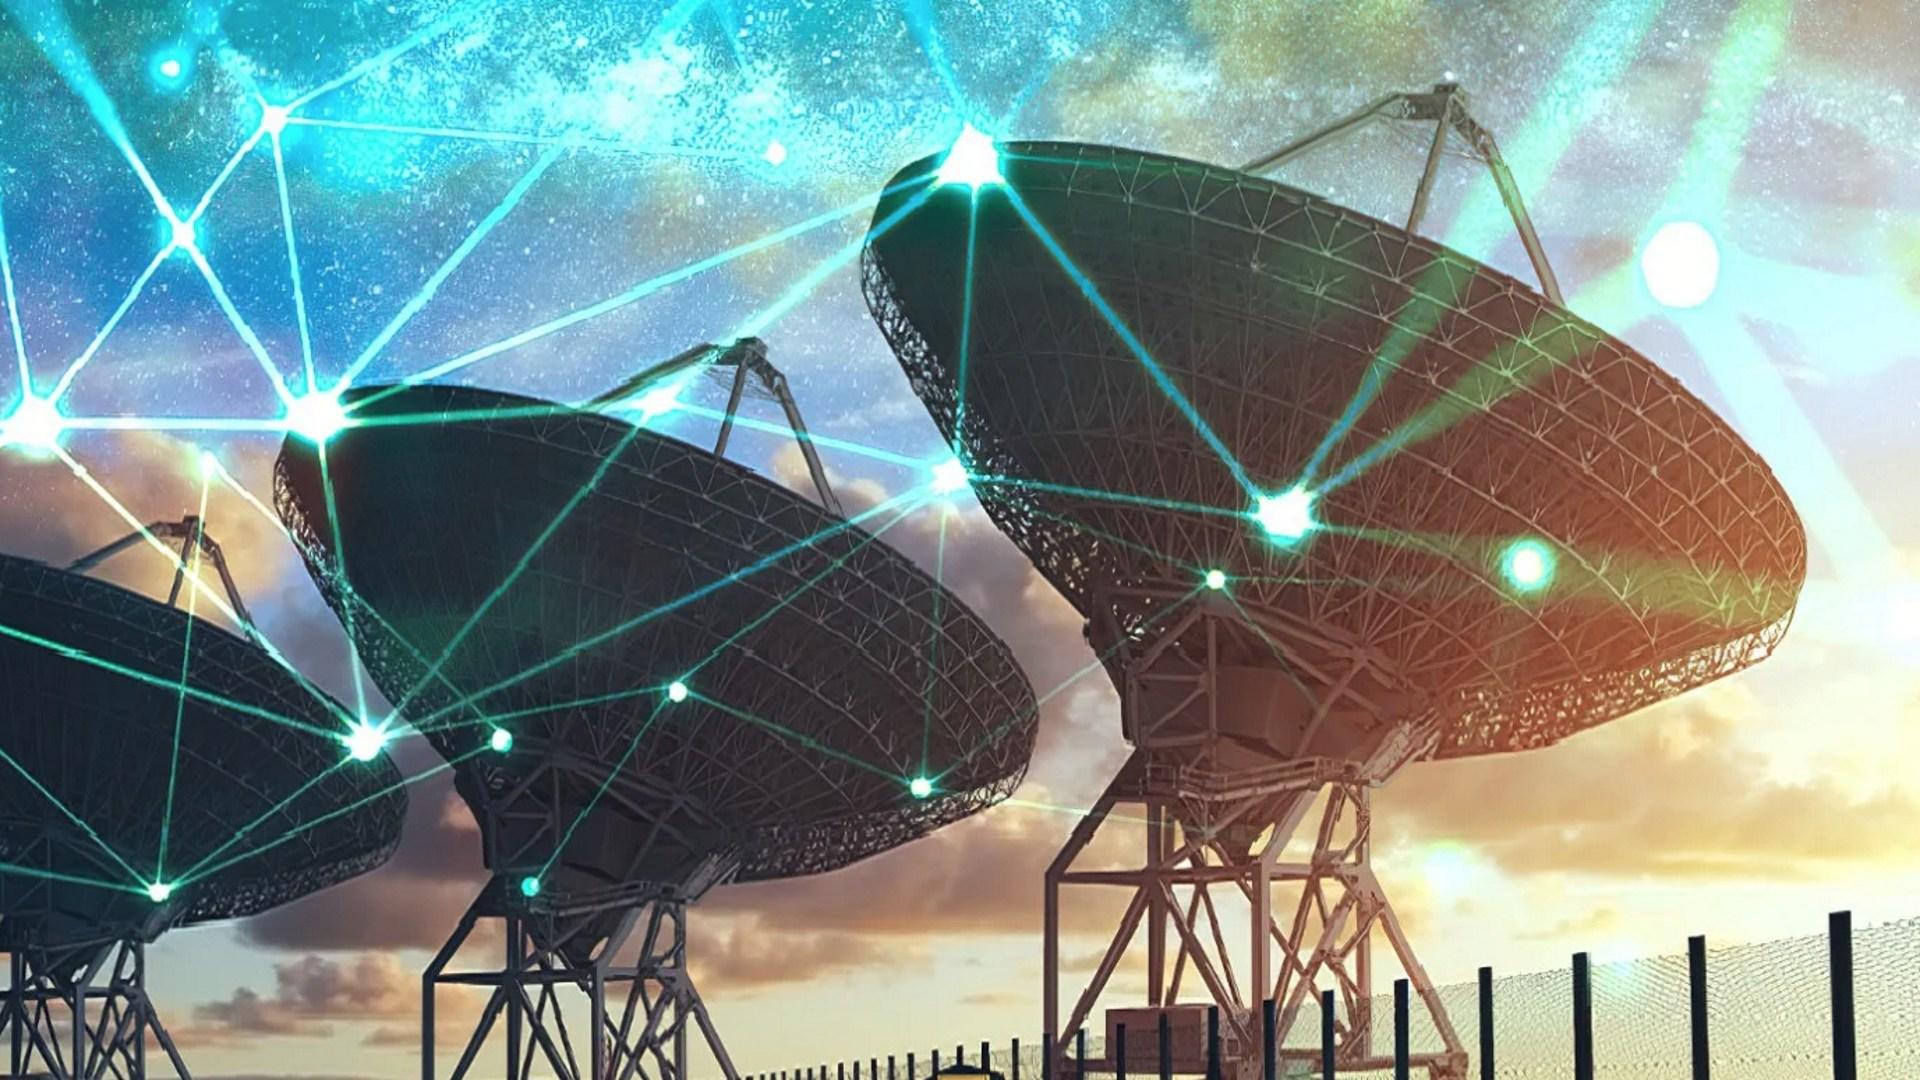 Internet, Daten, Netzwerk, Weltraum, Navigation, Satellit, Datenübertragung, Traffic, Funk, Telekommunikation, Gps, Teleskop, Satelliten, Vernetzung, Radioteleskop, Geodaten, Location, Satelliten Internet, Location-Tracking, Space, Geolocation, Wüste, Satellitennavigation, Satellitenschüssel, Weltraumteleskop, Telescope, Very Large Telescope, Infrarotteleskop